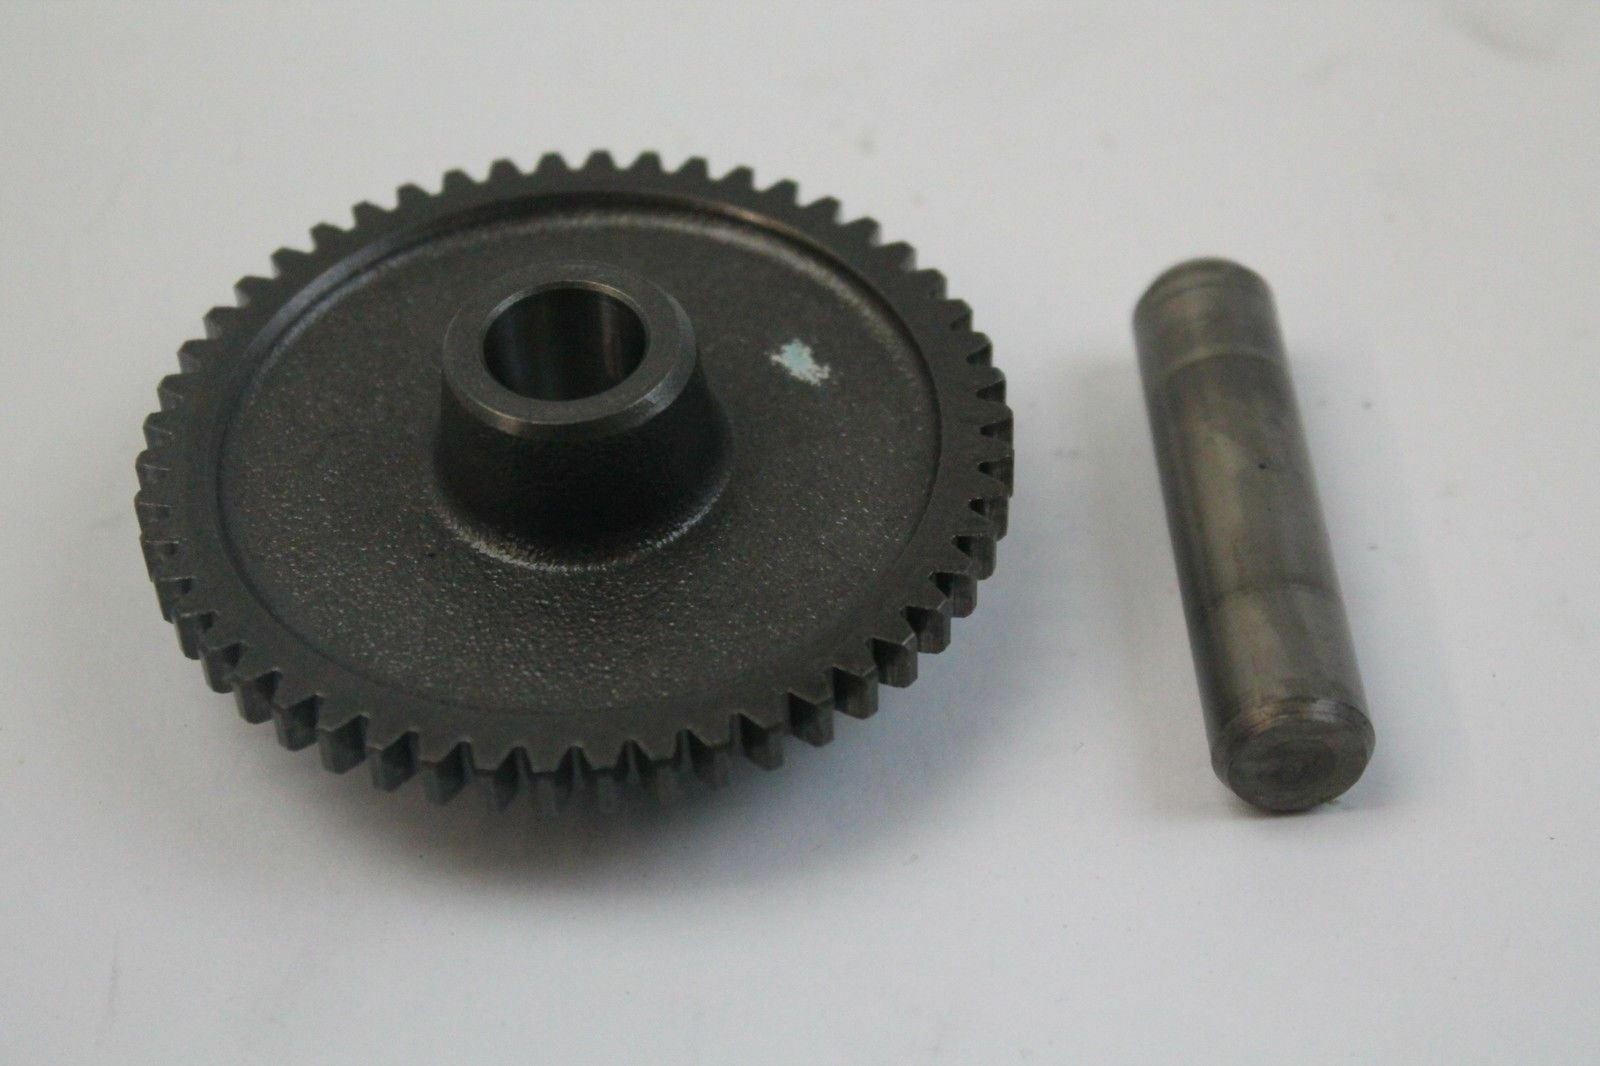 05-10 YAMAHA V STAR 650 XVS650 CUSTOM Engine Starter Gears